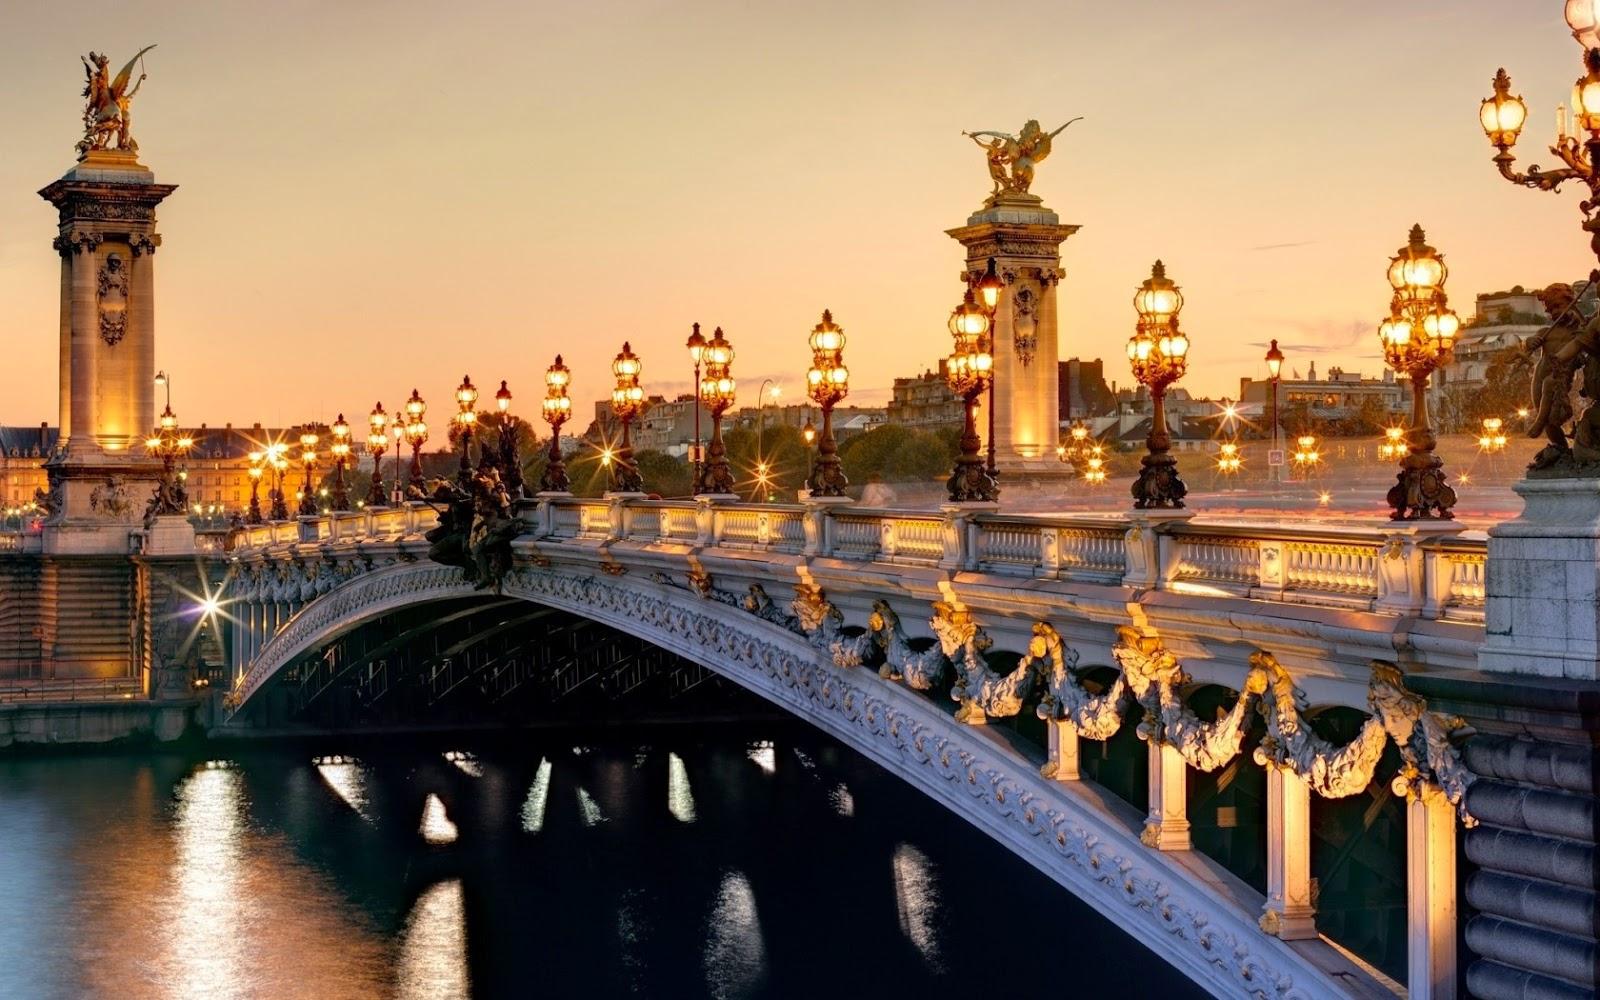 http://pt.best-wallpaper.net/France-Paris-Pont-Alexandre-III-Seine-river-city-lights-night-scenery_1680x1050.html